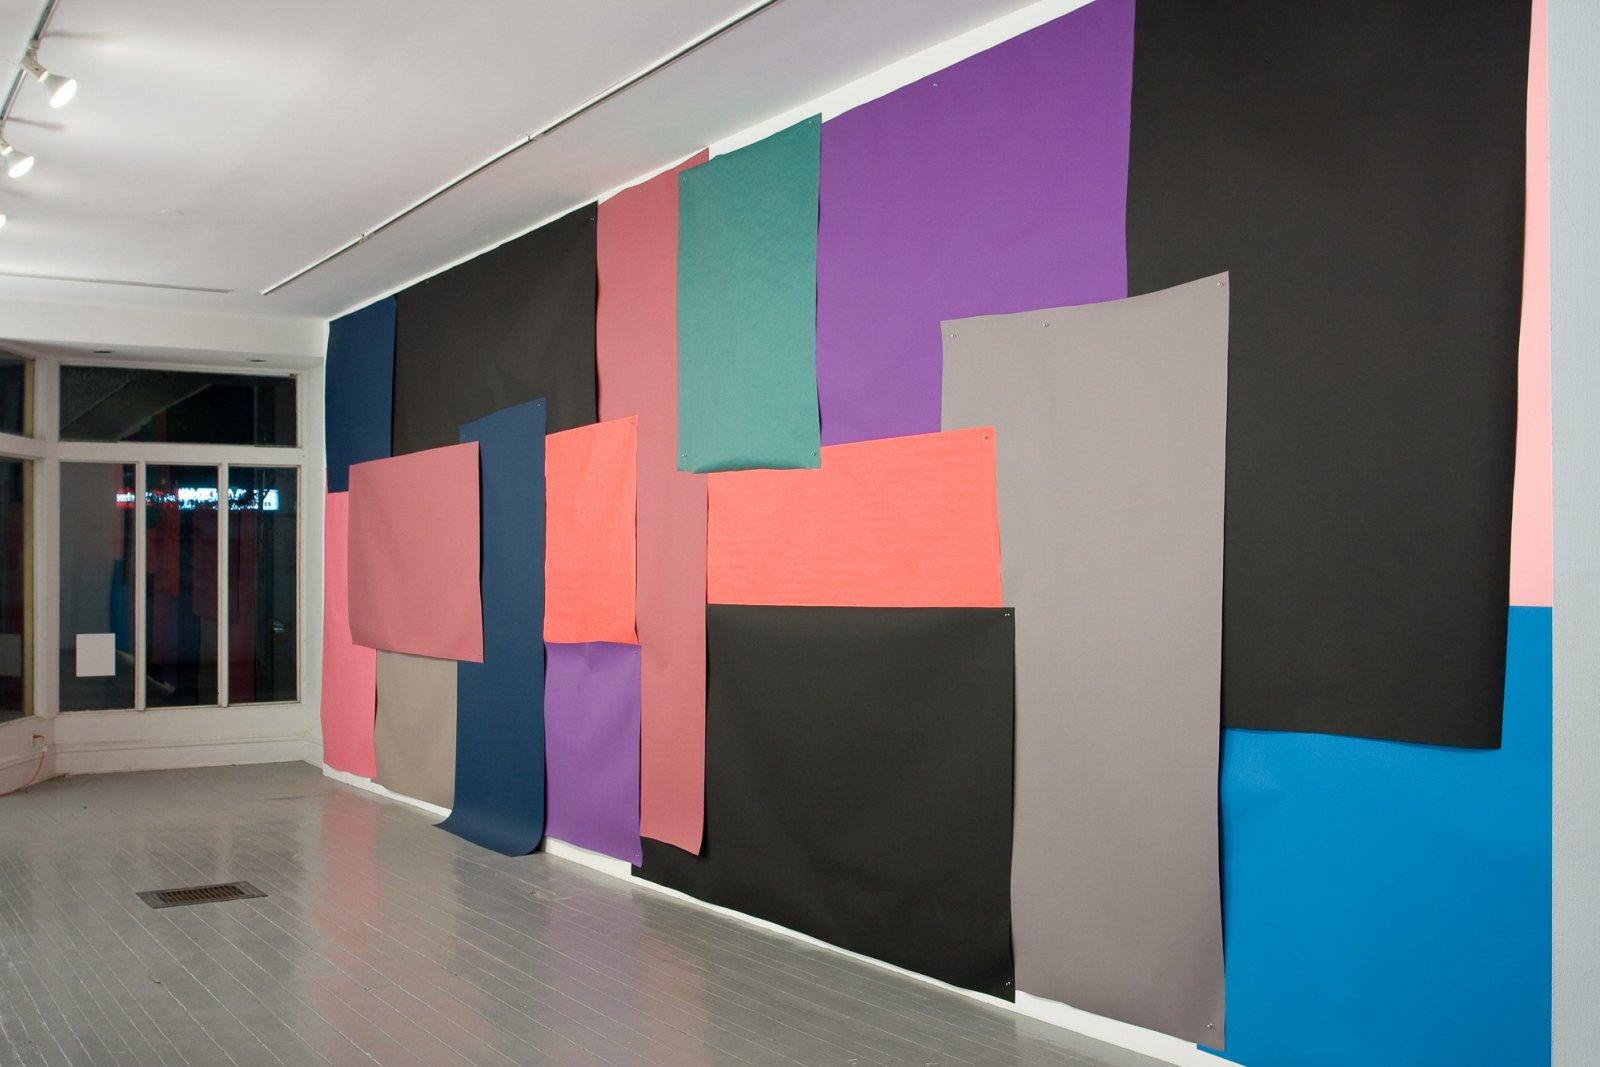 Elizabeth McIntosh, Cut Out, 2009, photo backdrop paper and aluminum push pins, 180 x 216 in. (457 x 549 cm) by Elizabeth McIntosh